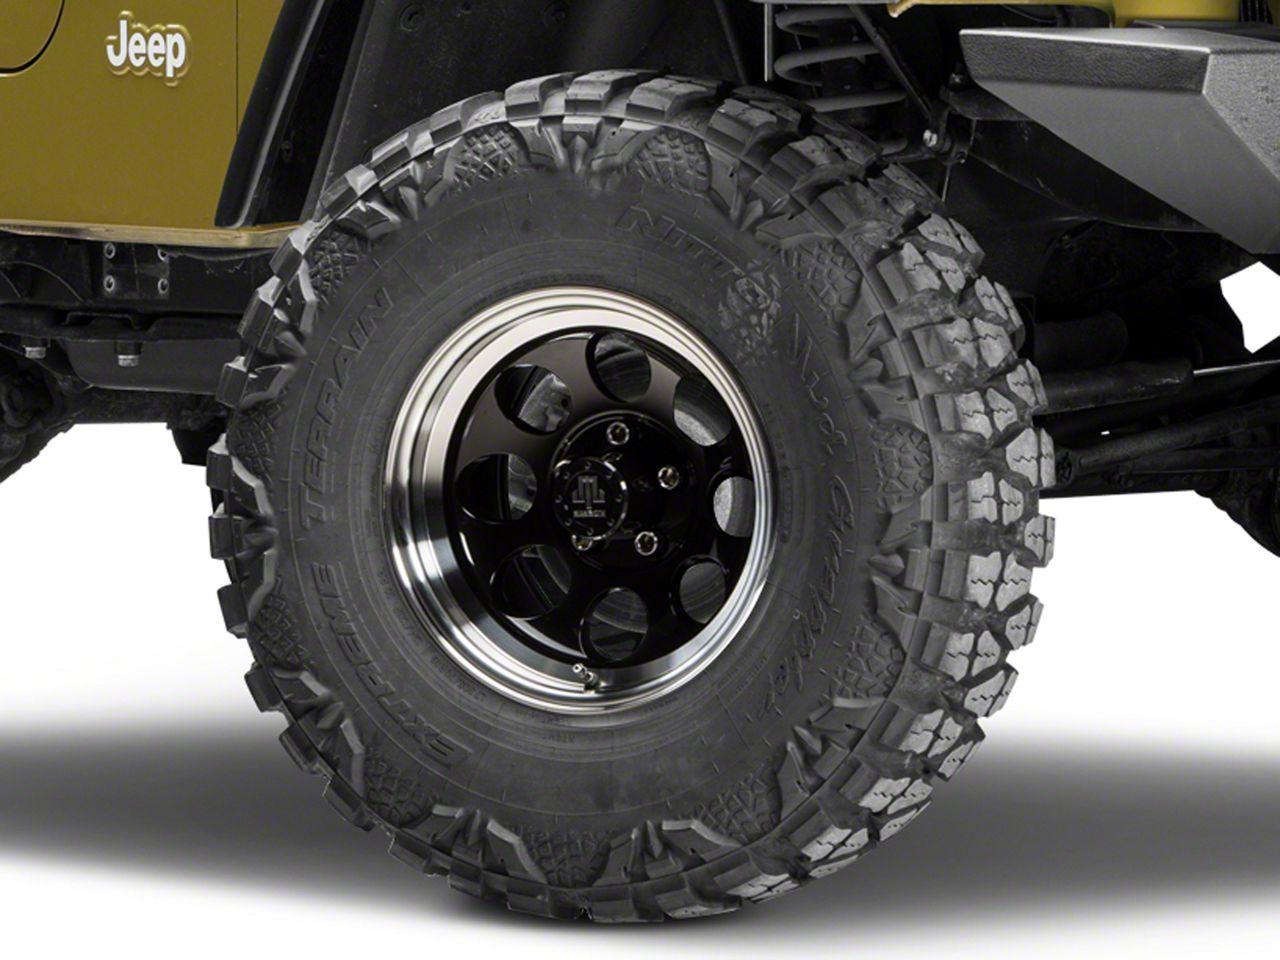 mammoth jeep wrangler 8 black wheel 15x8 j100600 87 06 jeep Jeep Wagoneer mammoth jeep wrangler 8 black wheel 15x8 j100600 87 06 jeep wrangler yj tj